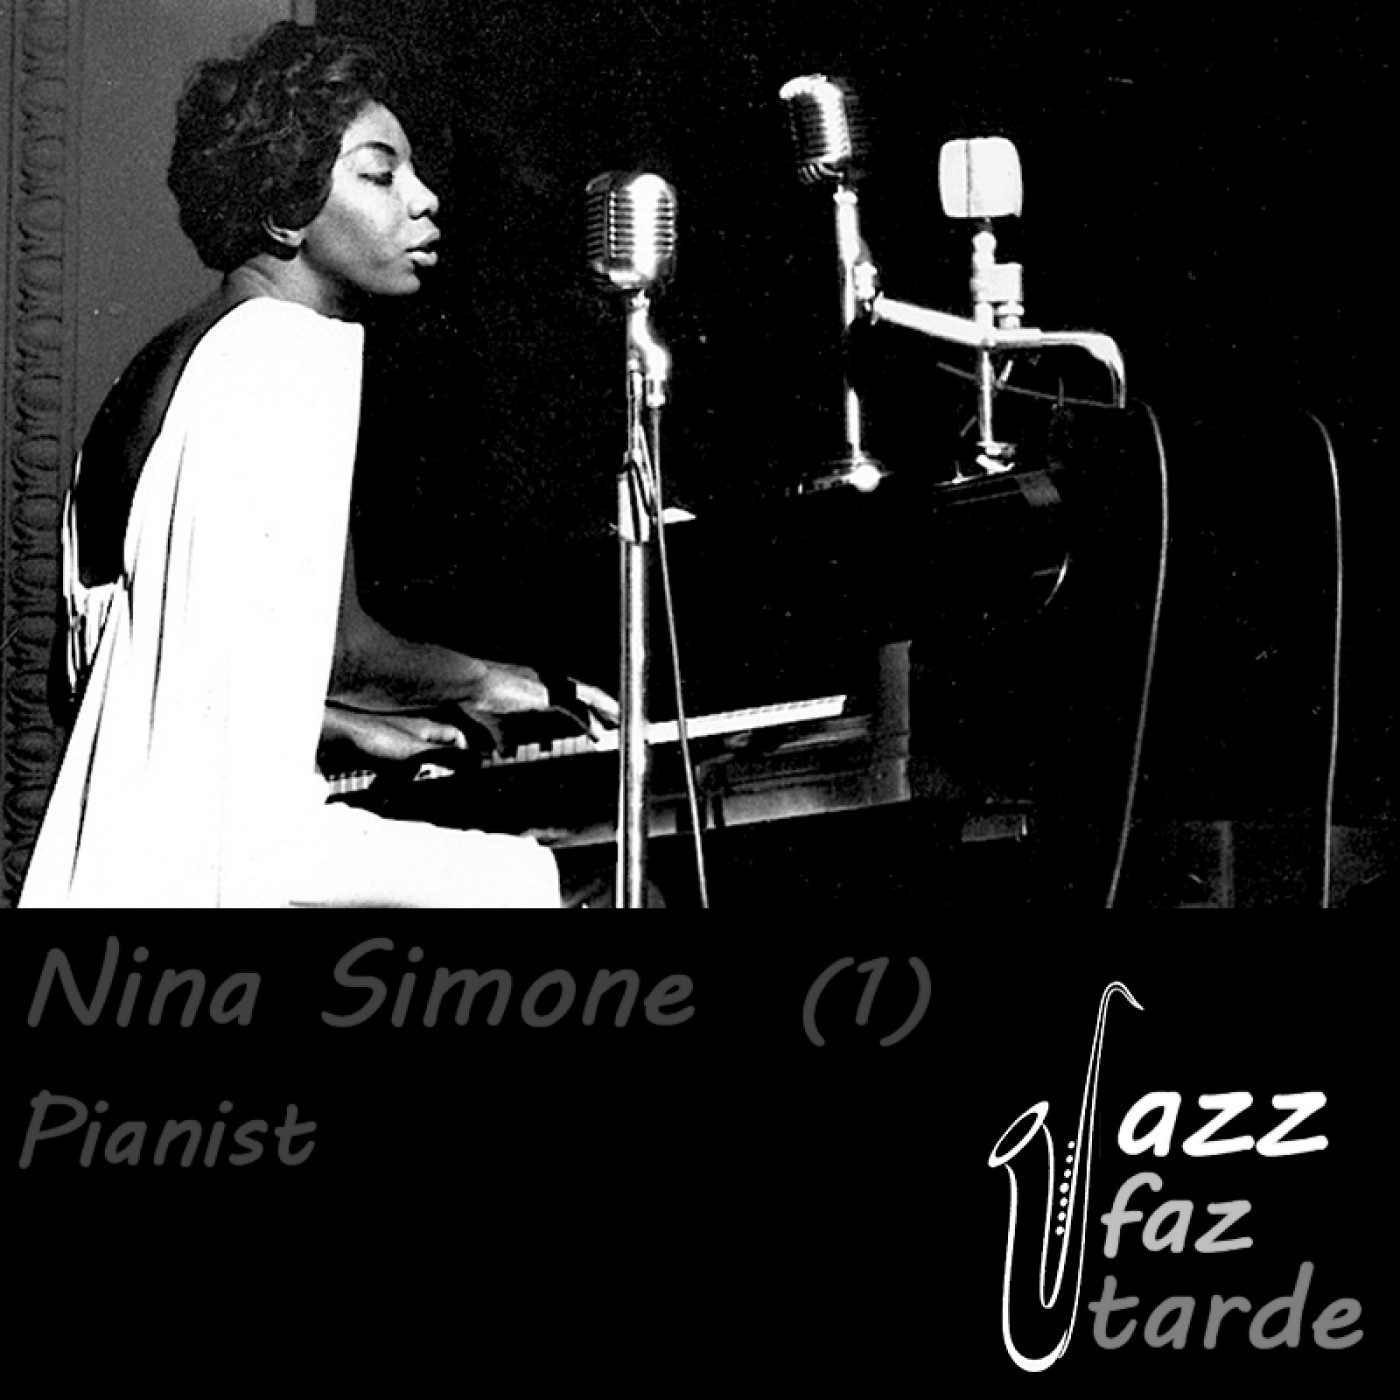 Nina Simone (1/4) - The Pianist